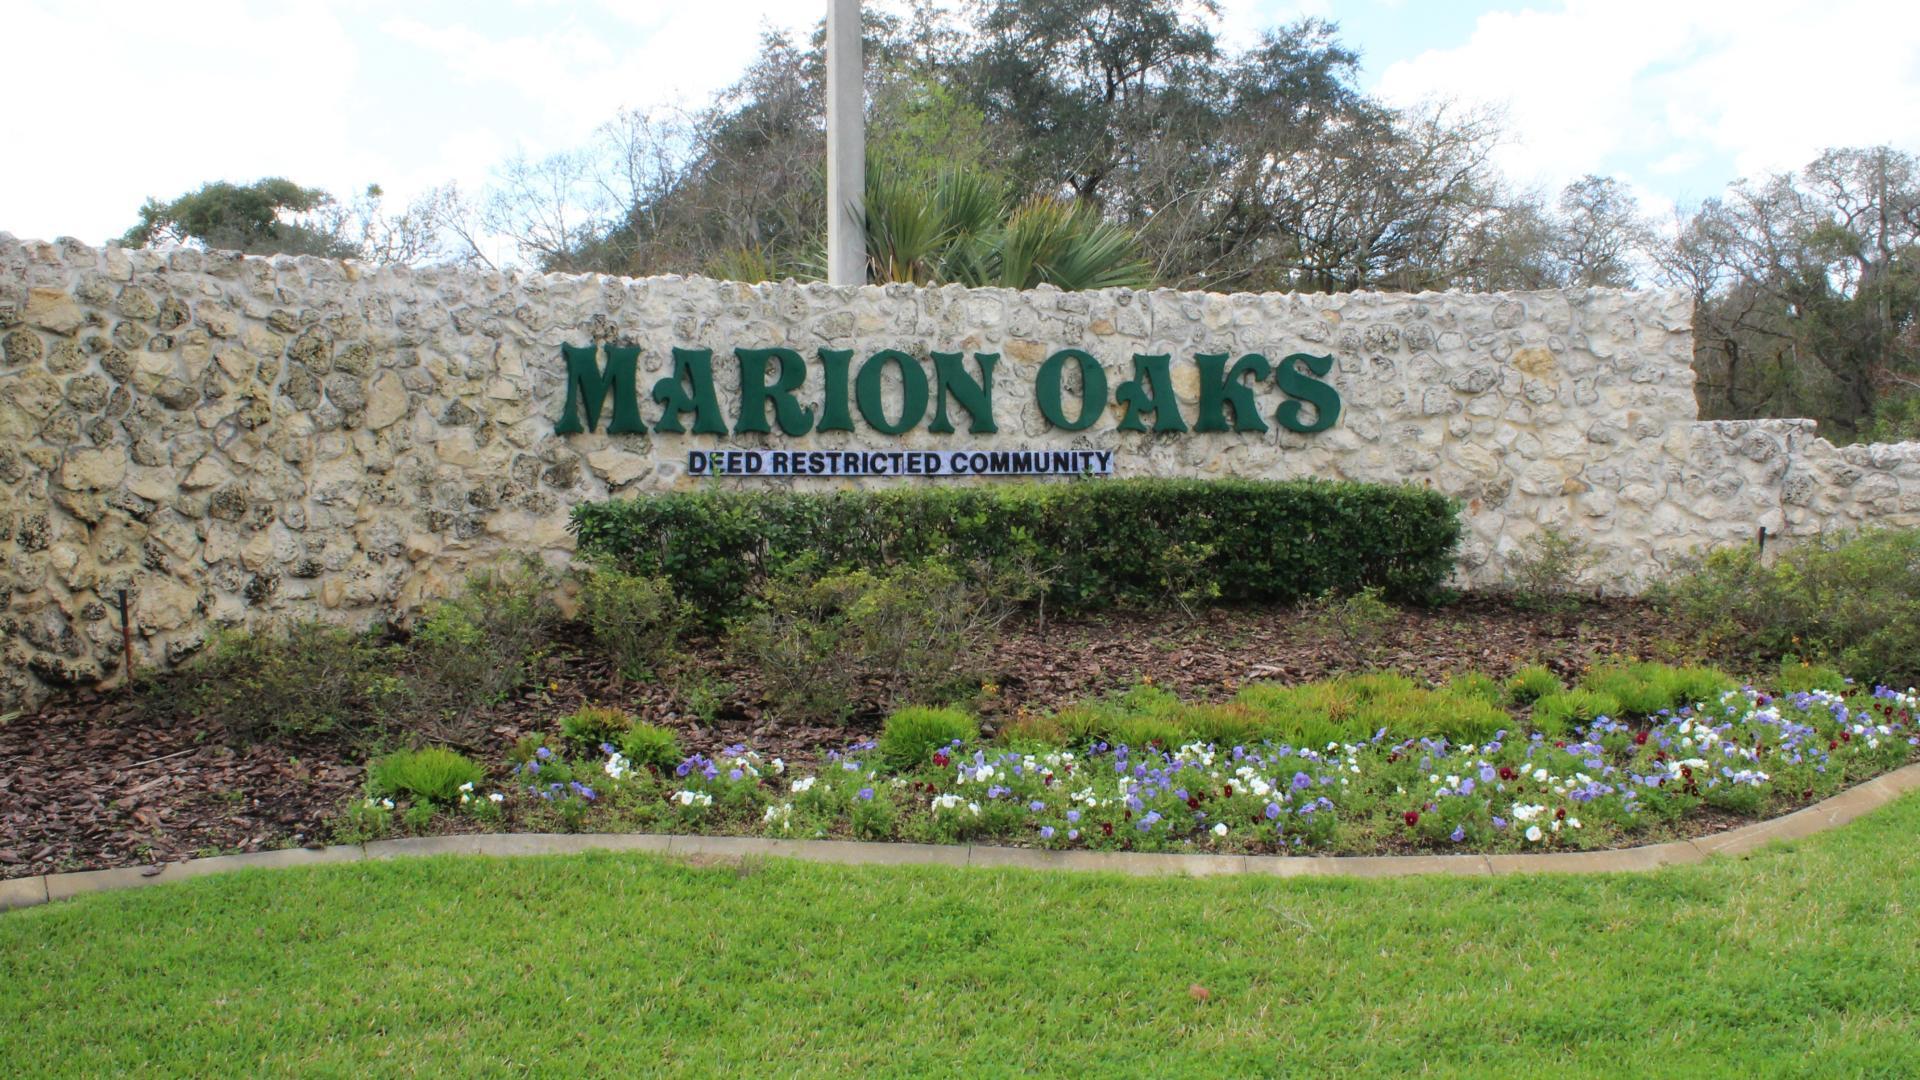 Marion Oaks,34473